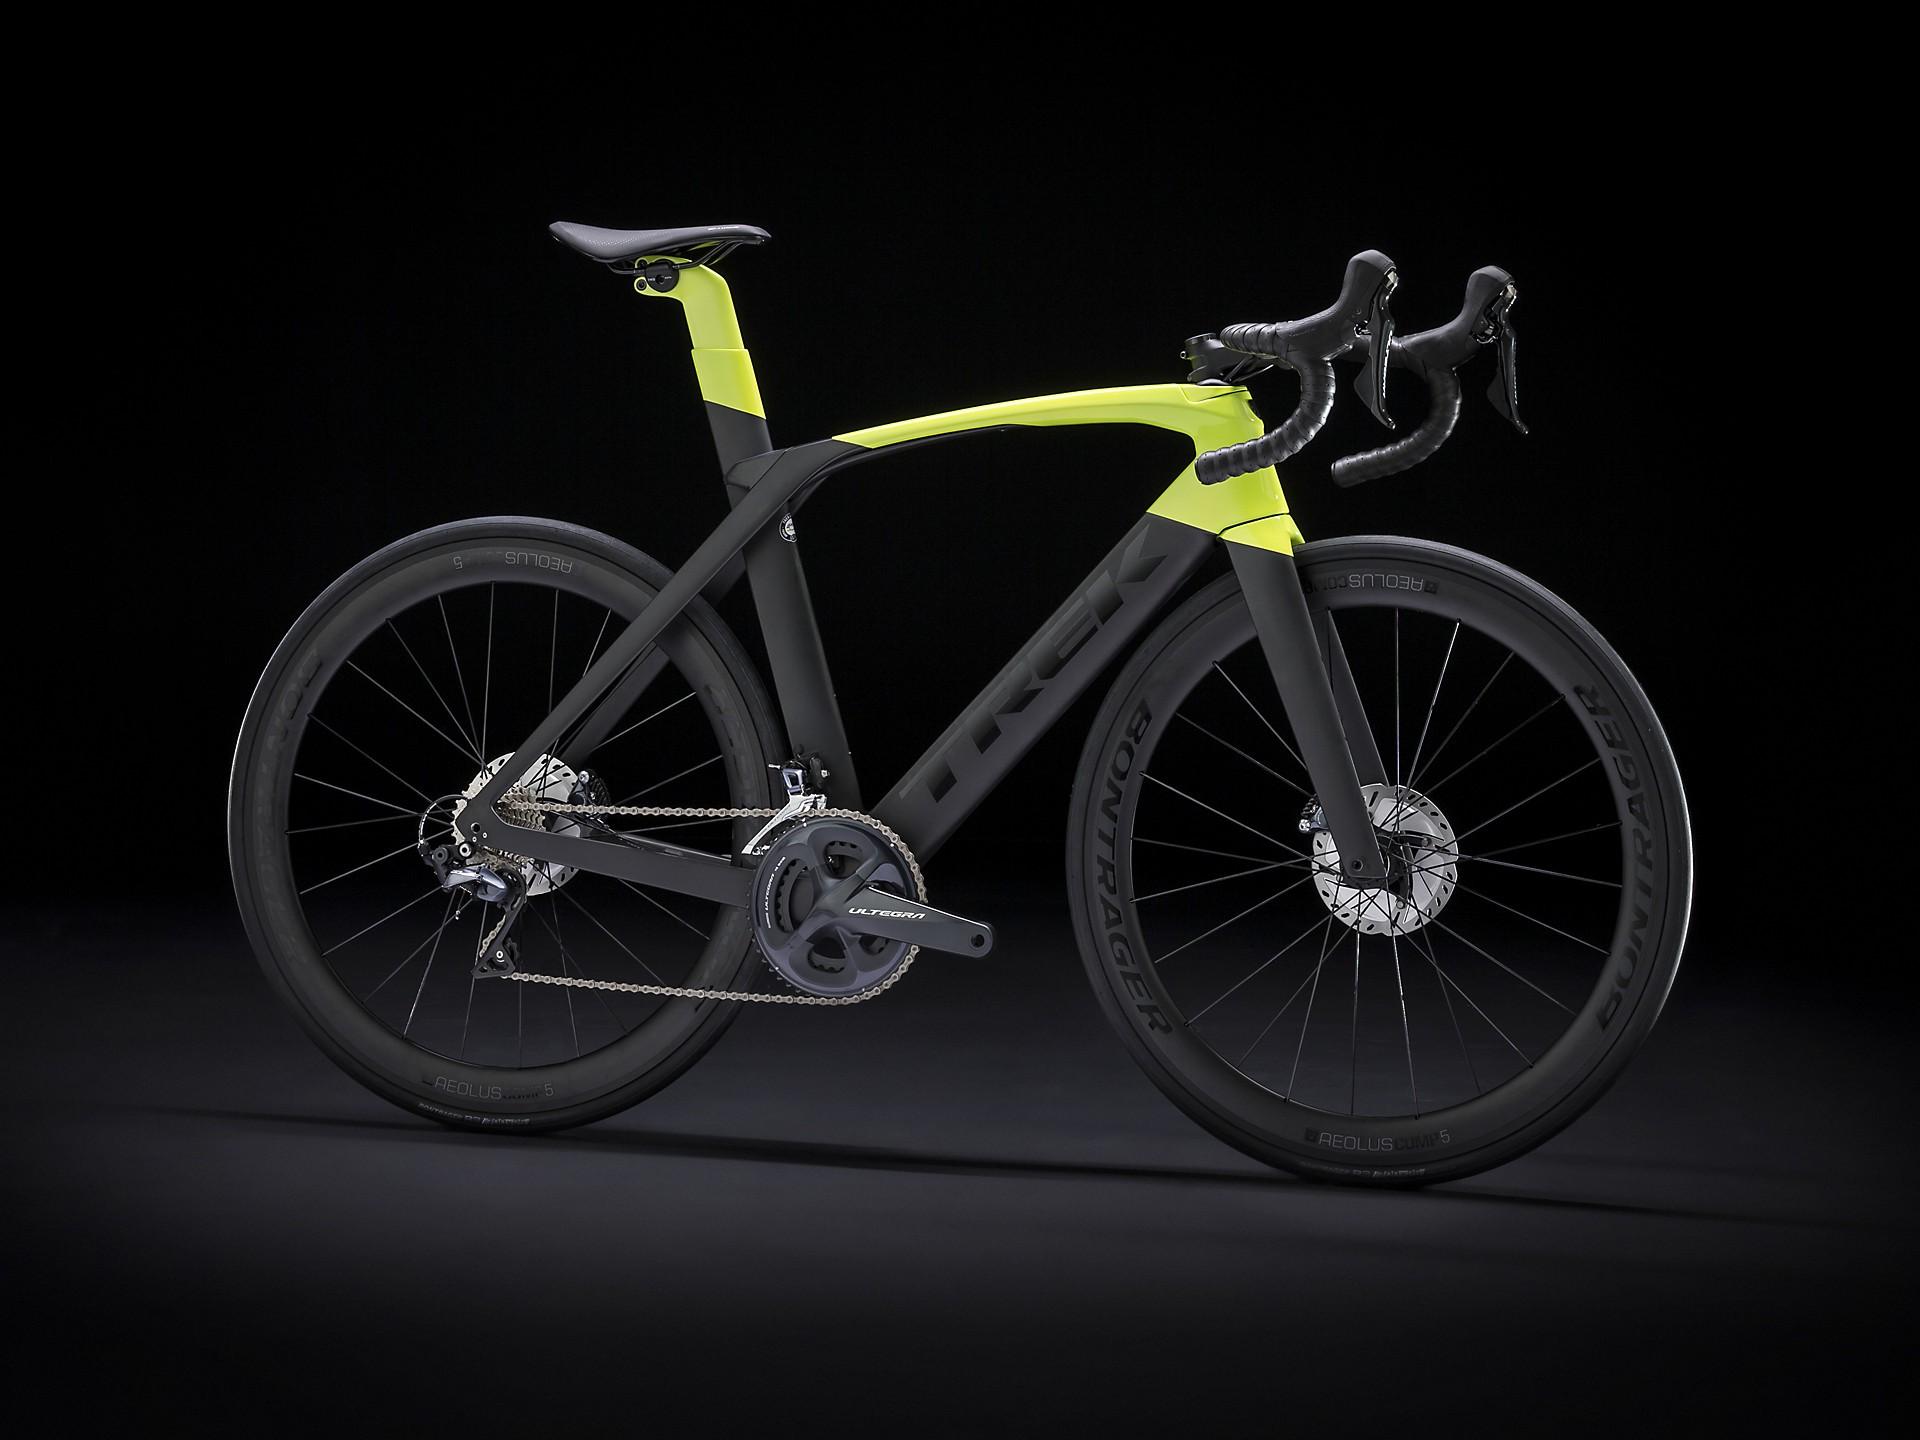 Bicicleta Trek Madone SL6 Disco na cor preto e amarelo fluo